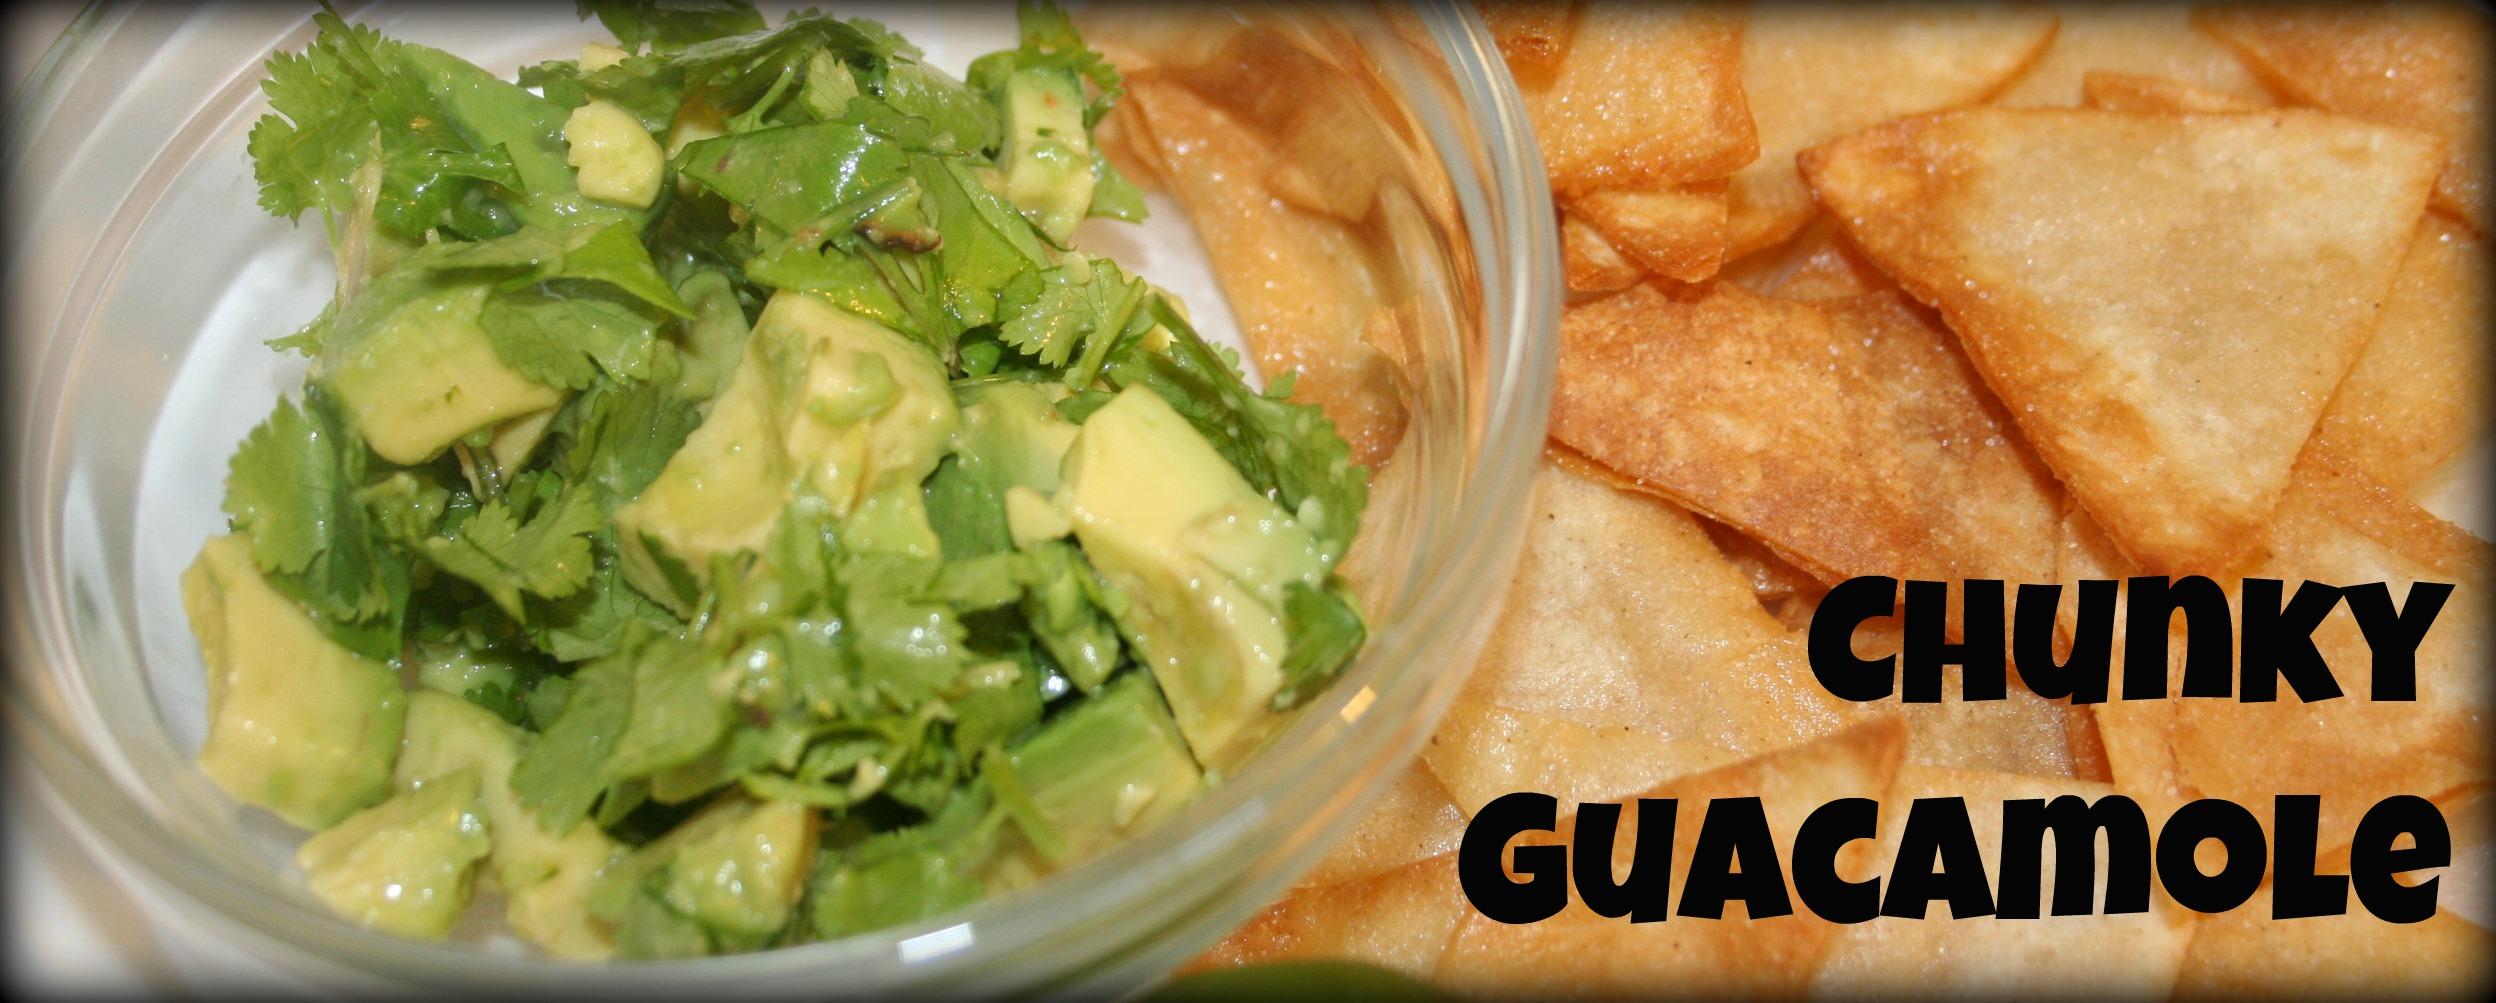 Chunky Guacamole Slider